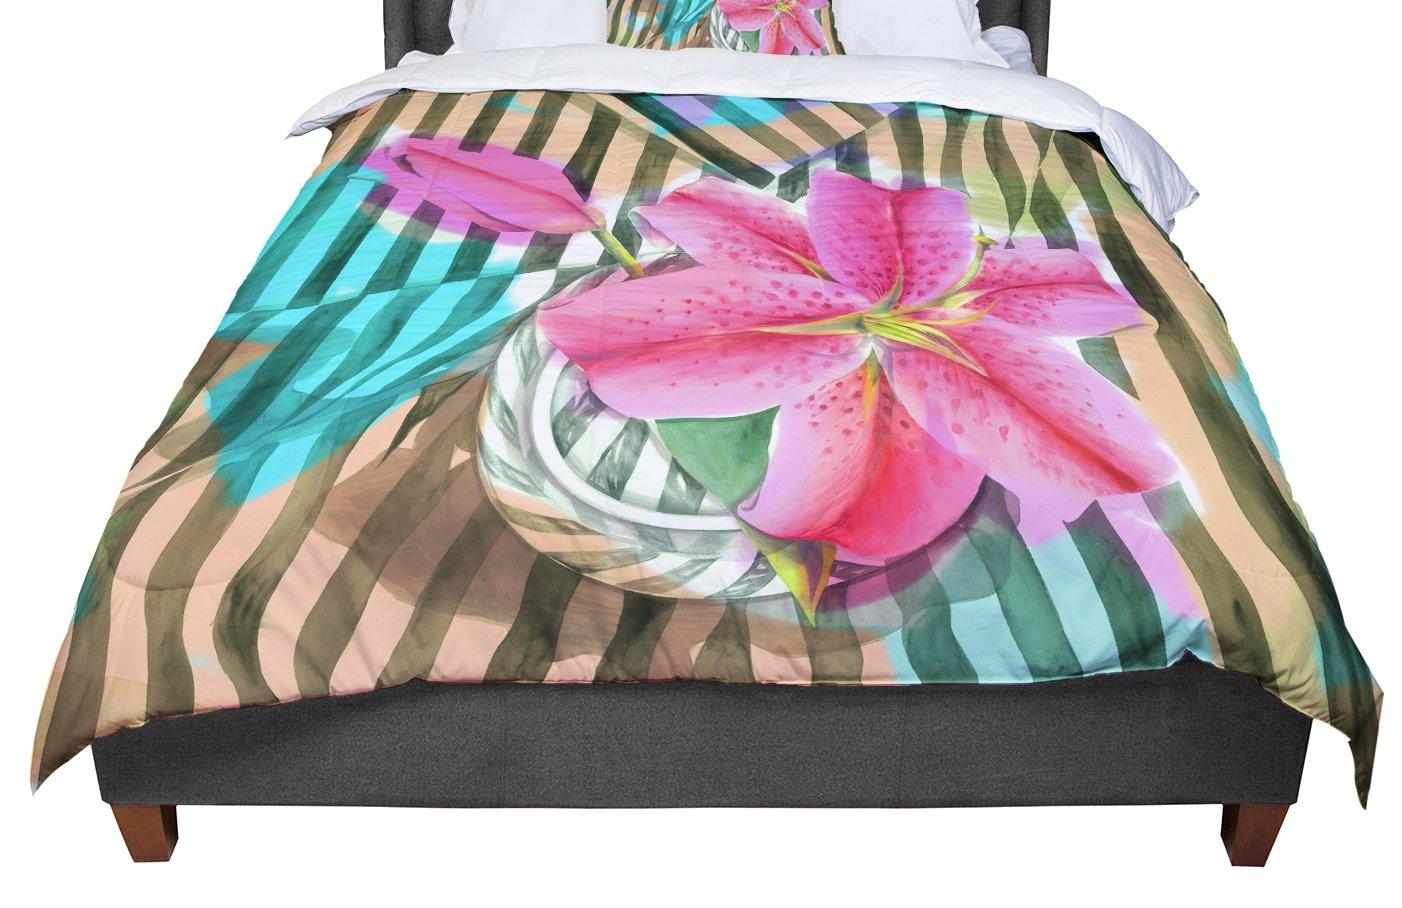 68 X 88 KESS InHouse Ebi Emporium Flamenco Moves Orange Pink Twin Comforter